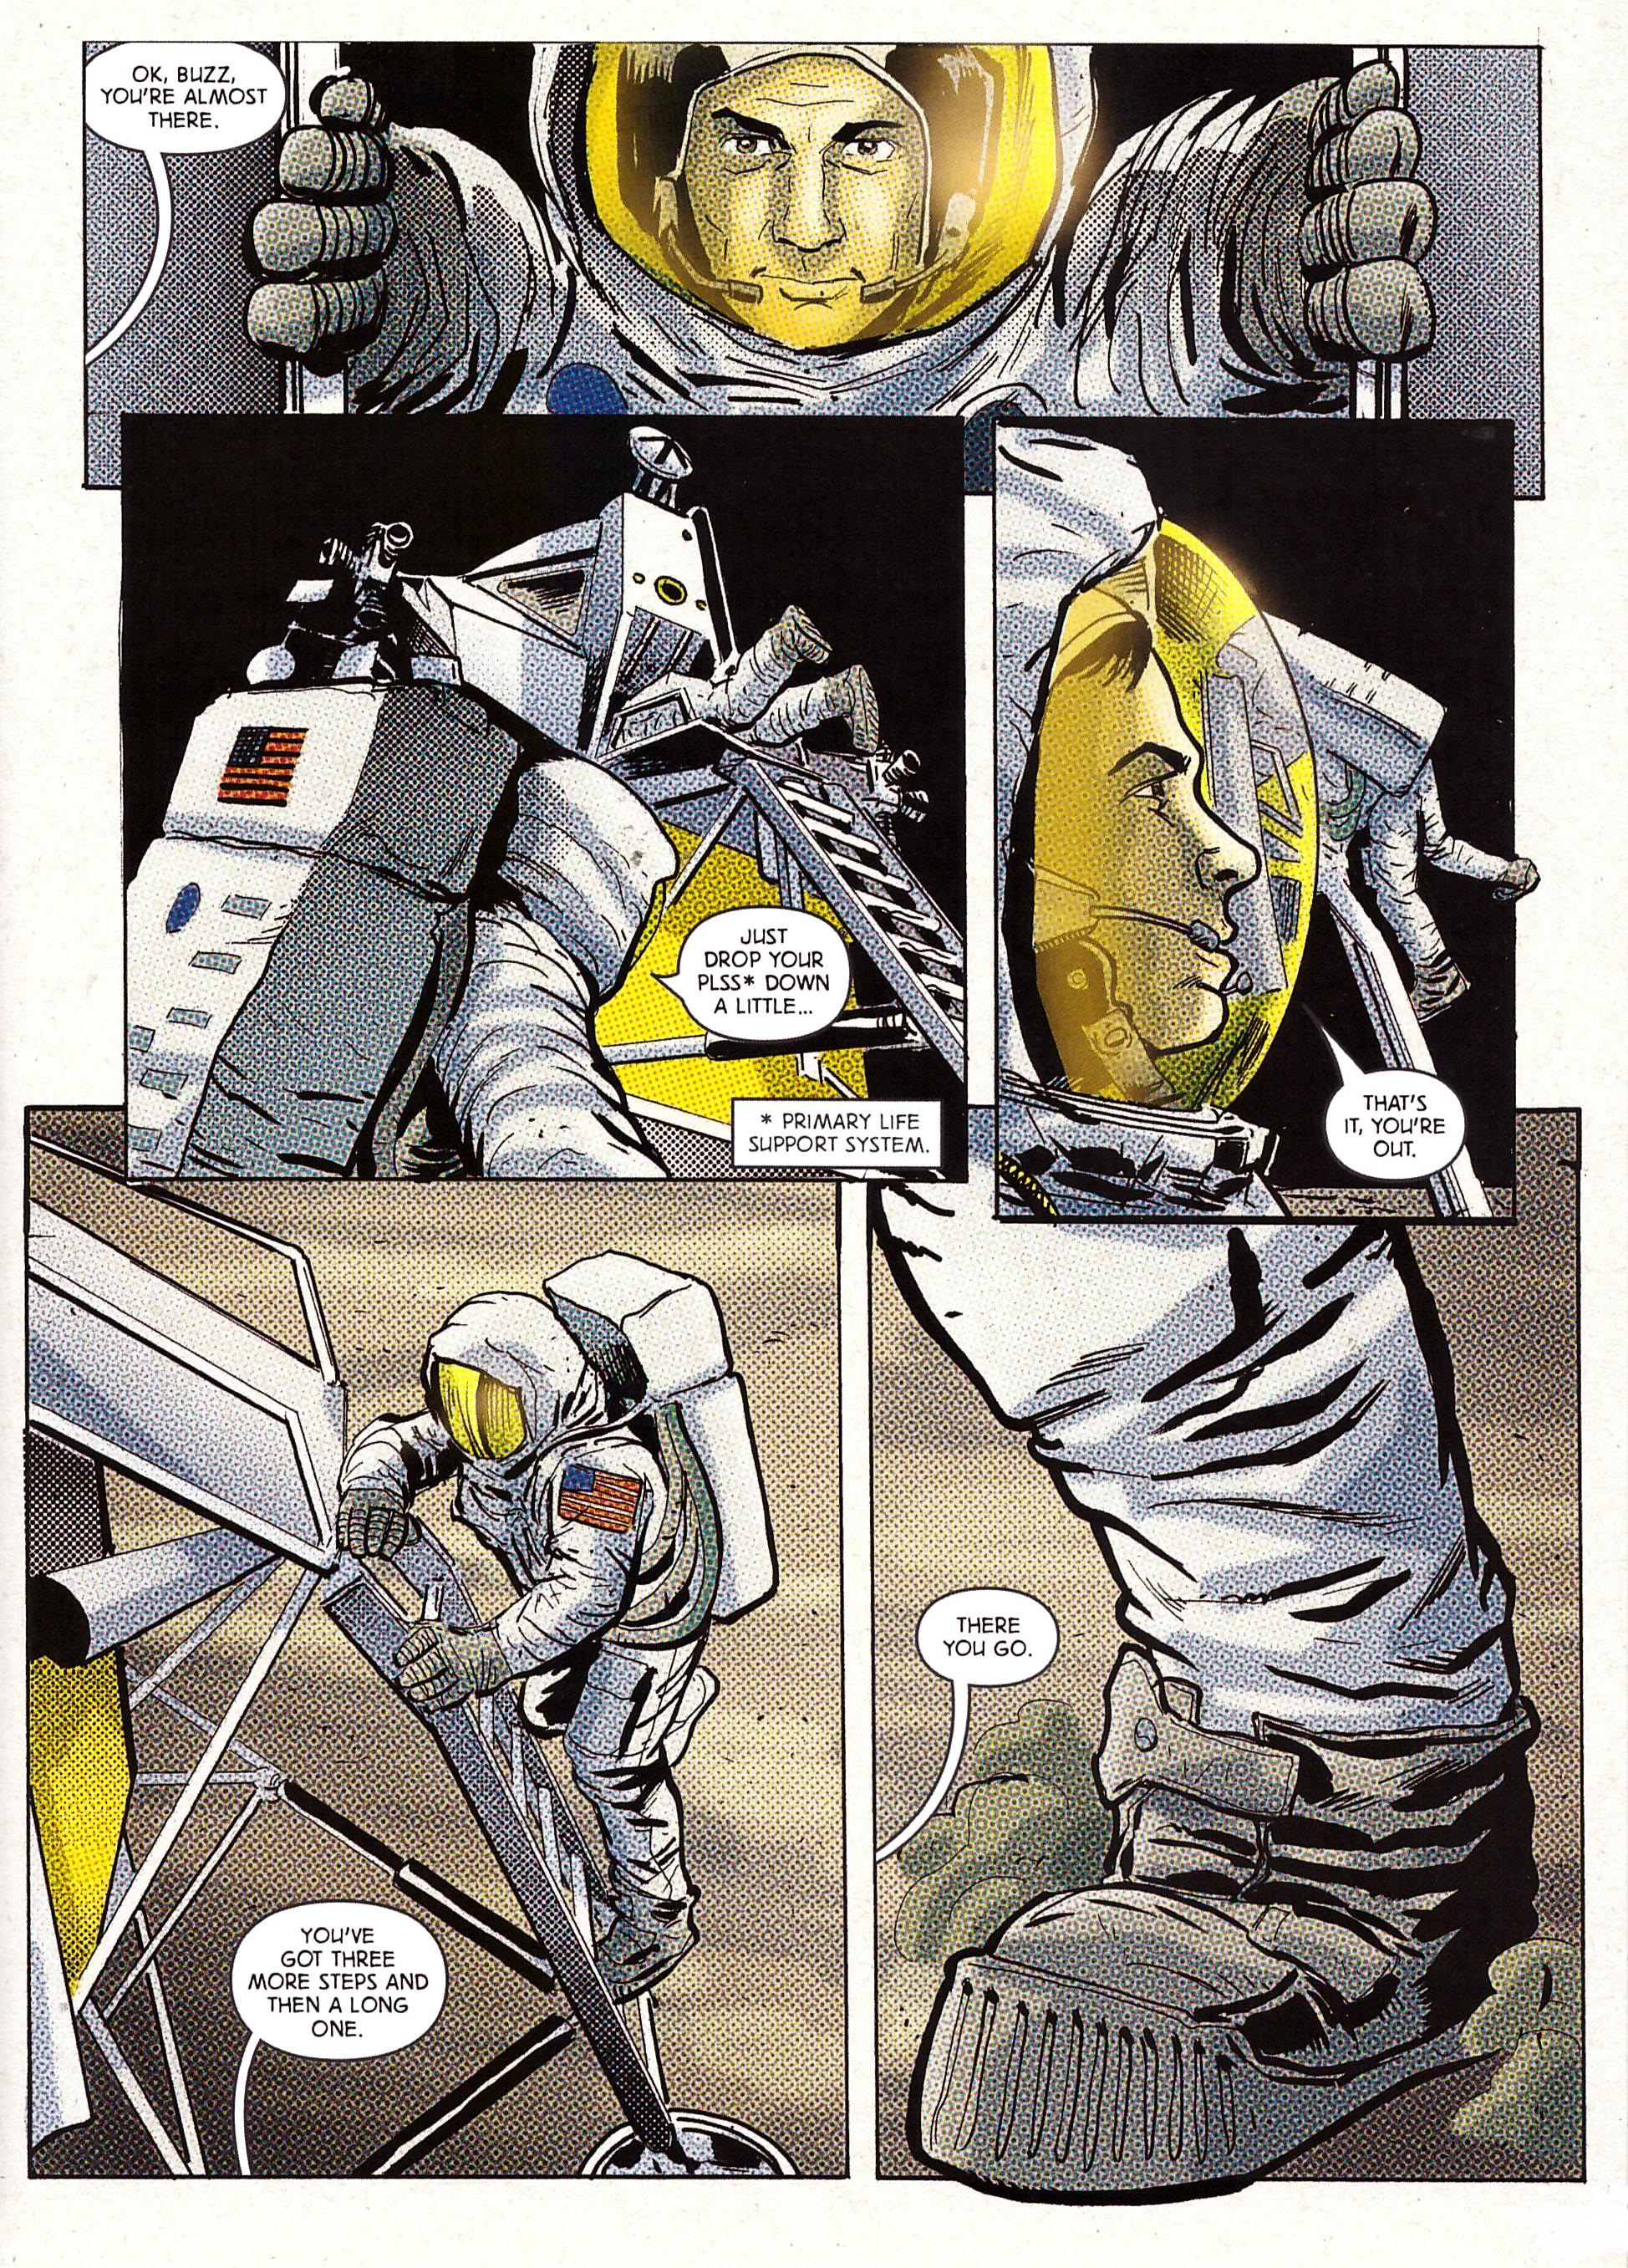 Apollo graphic novel review